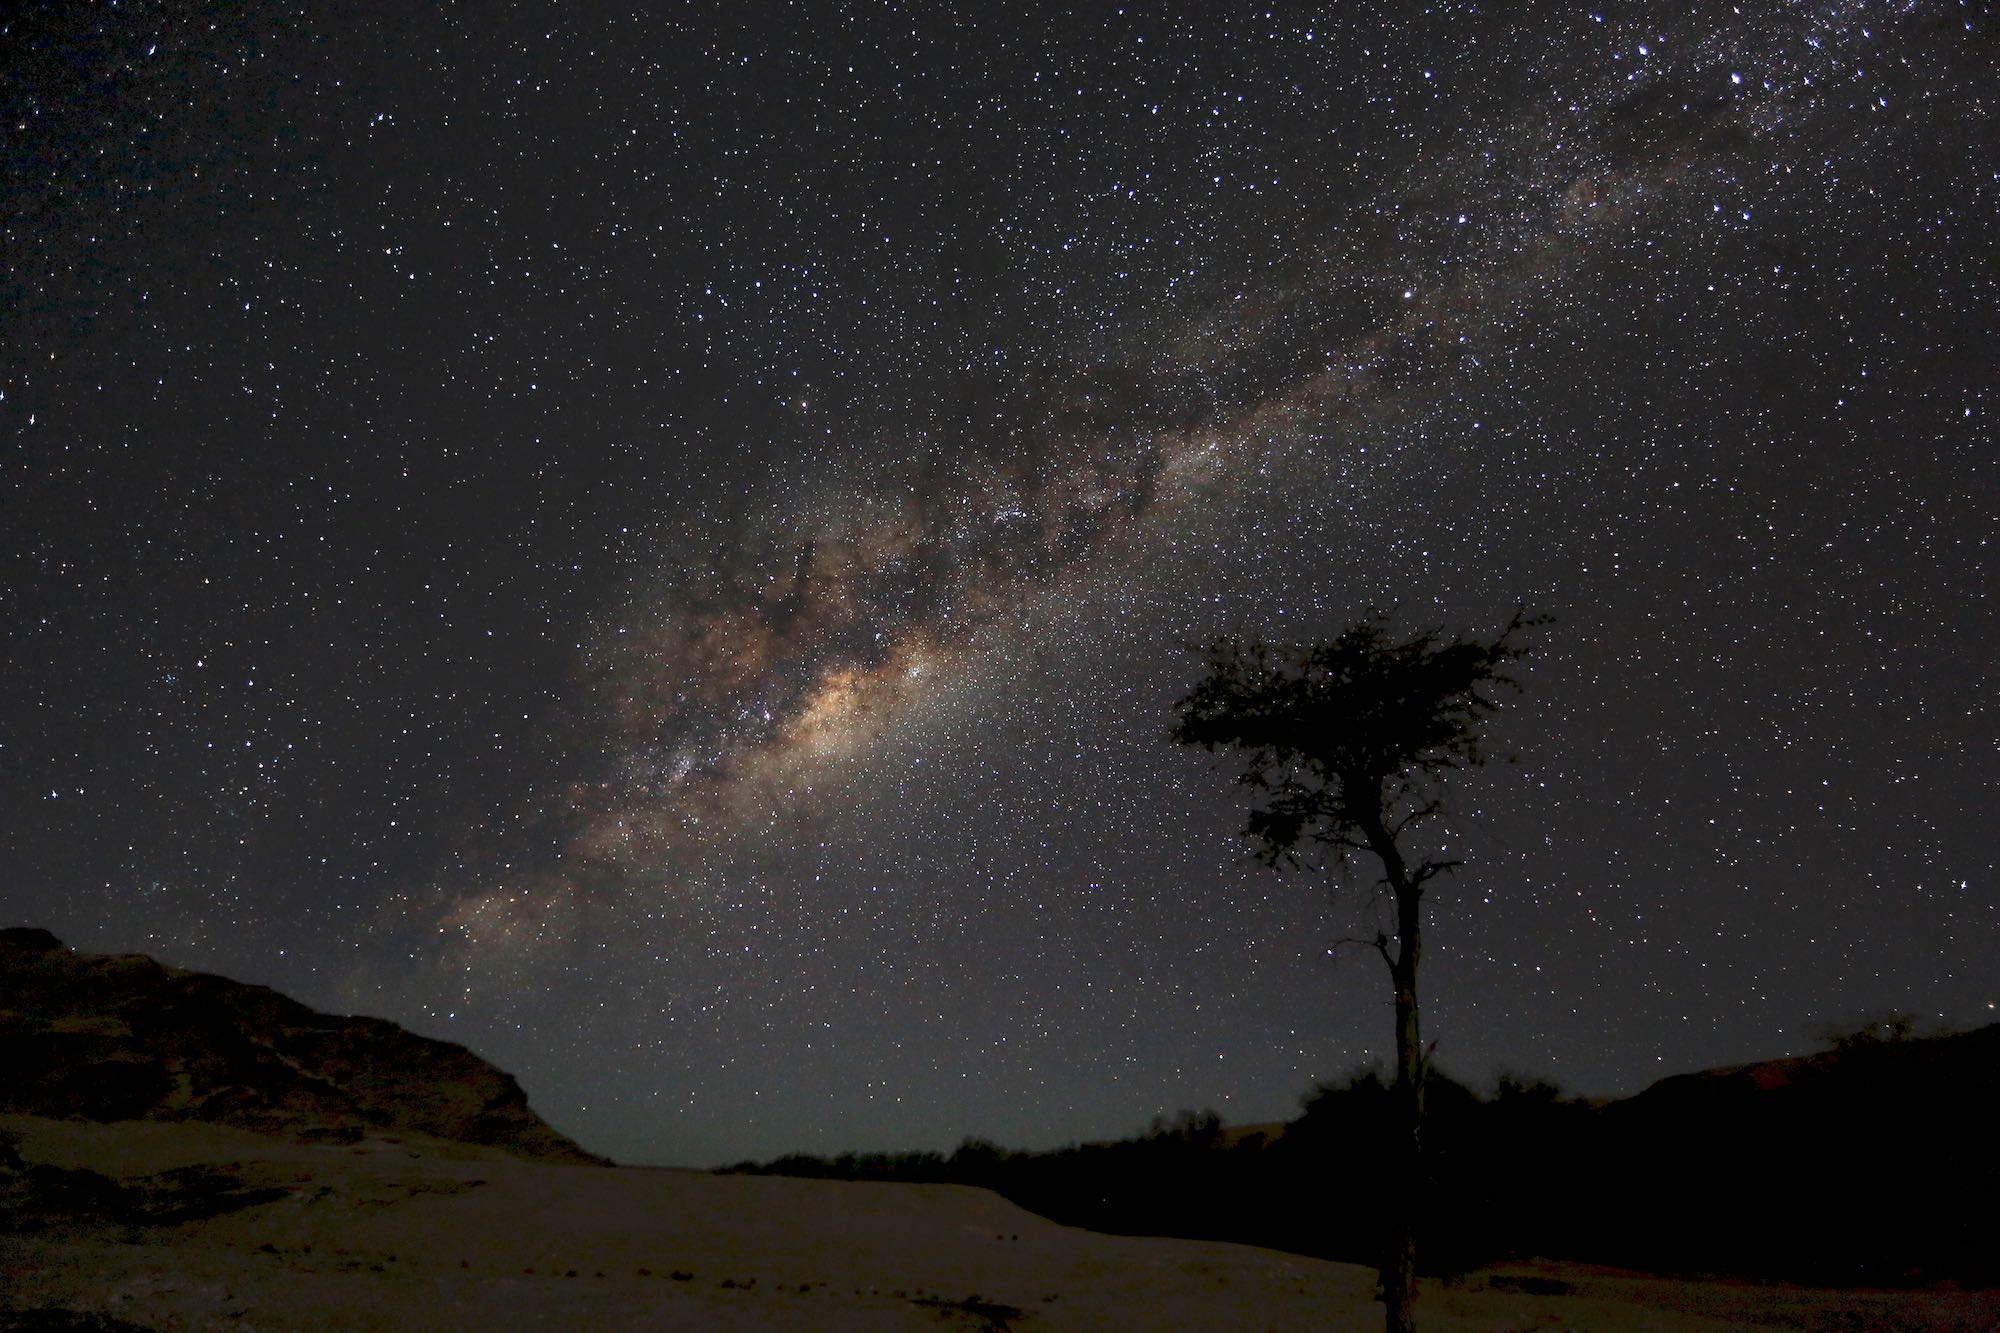 Michstraße im Sternenhimmel über der Namib, Namibia, Afrika